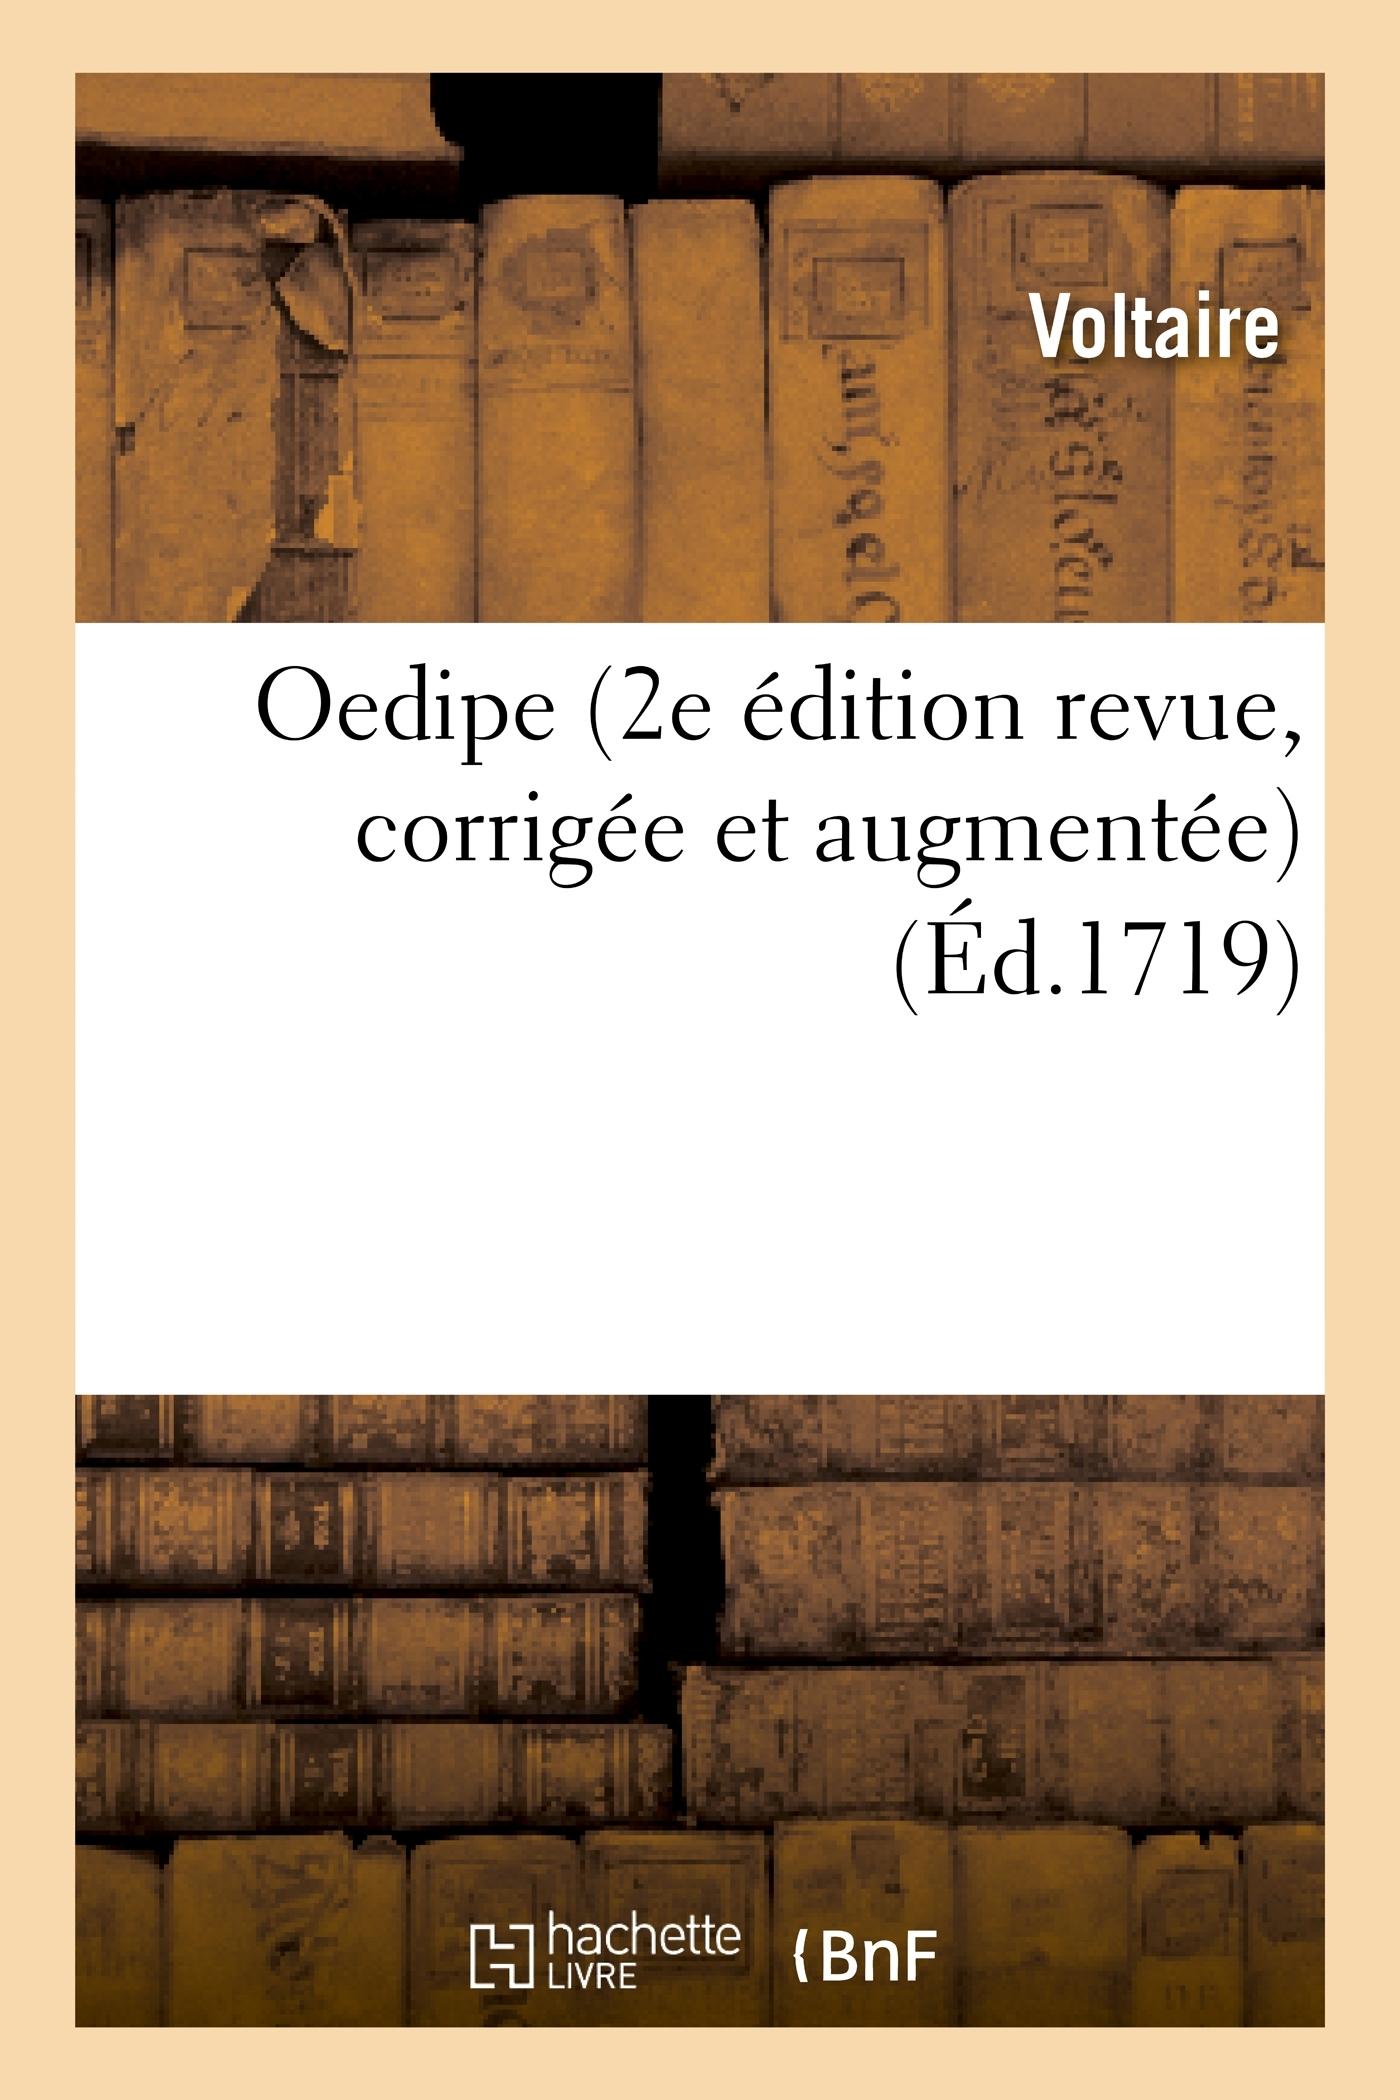 OEDIPE (2E EDITION REVUE, CORRIGEE ET AUGMENTEE)